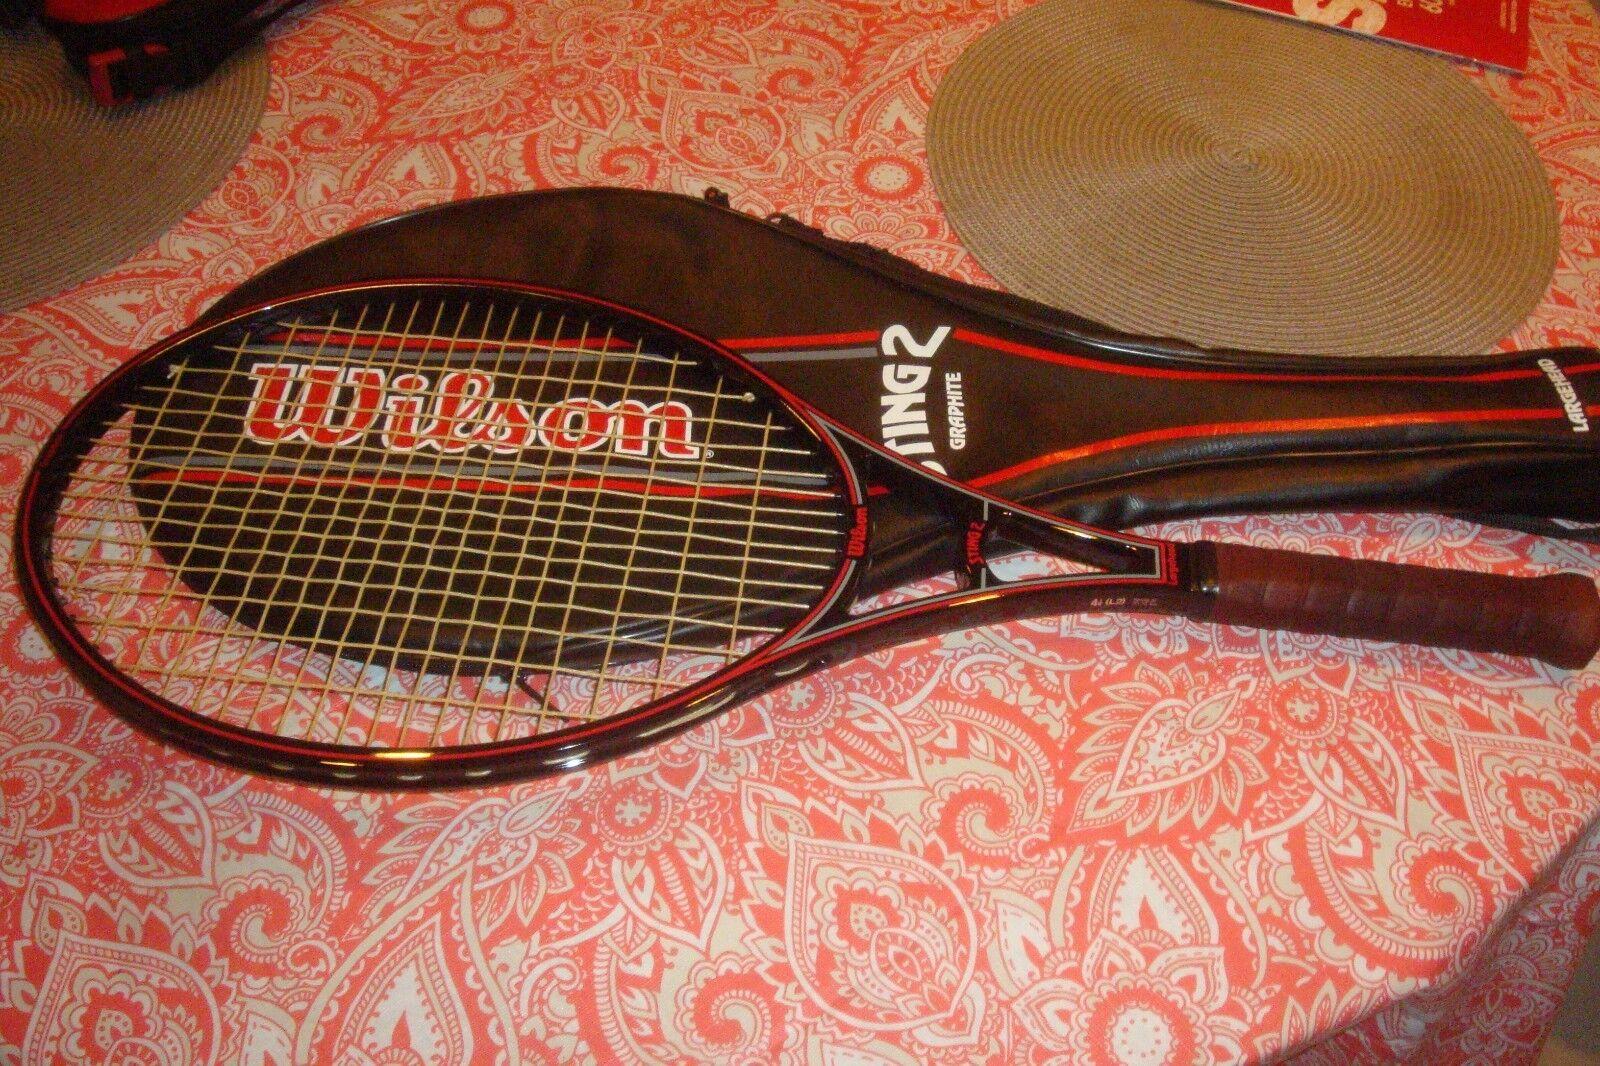 Wilson Sting 2 Largehead Graphite Tennis Racquet 4 1 4  Grip & Case  NEAR MINT